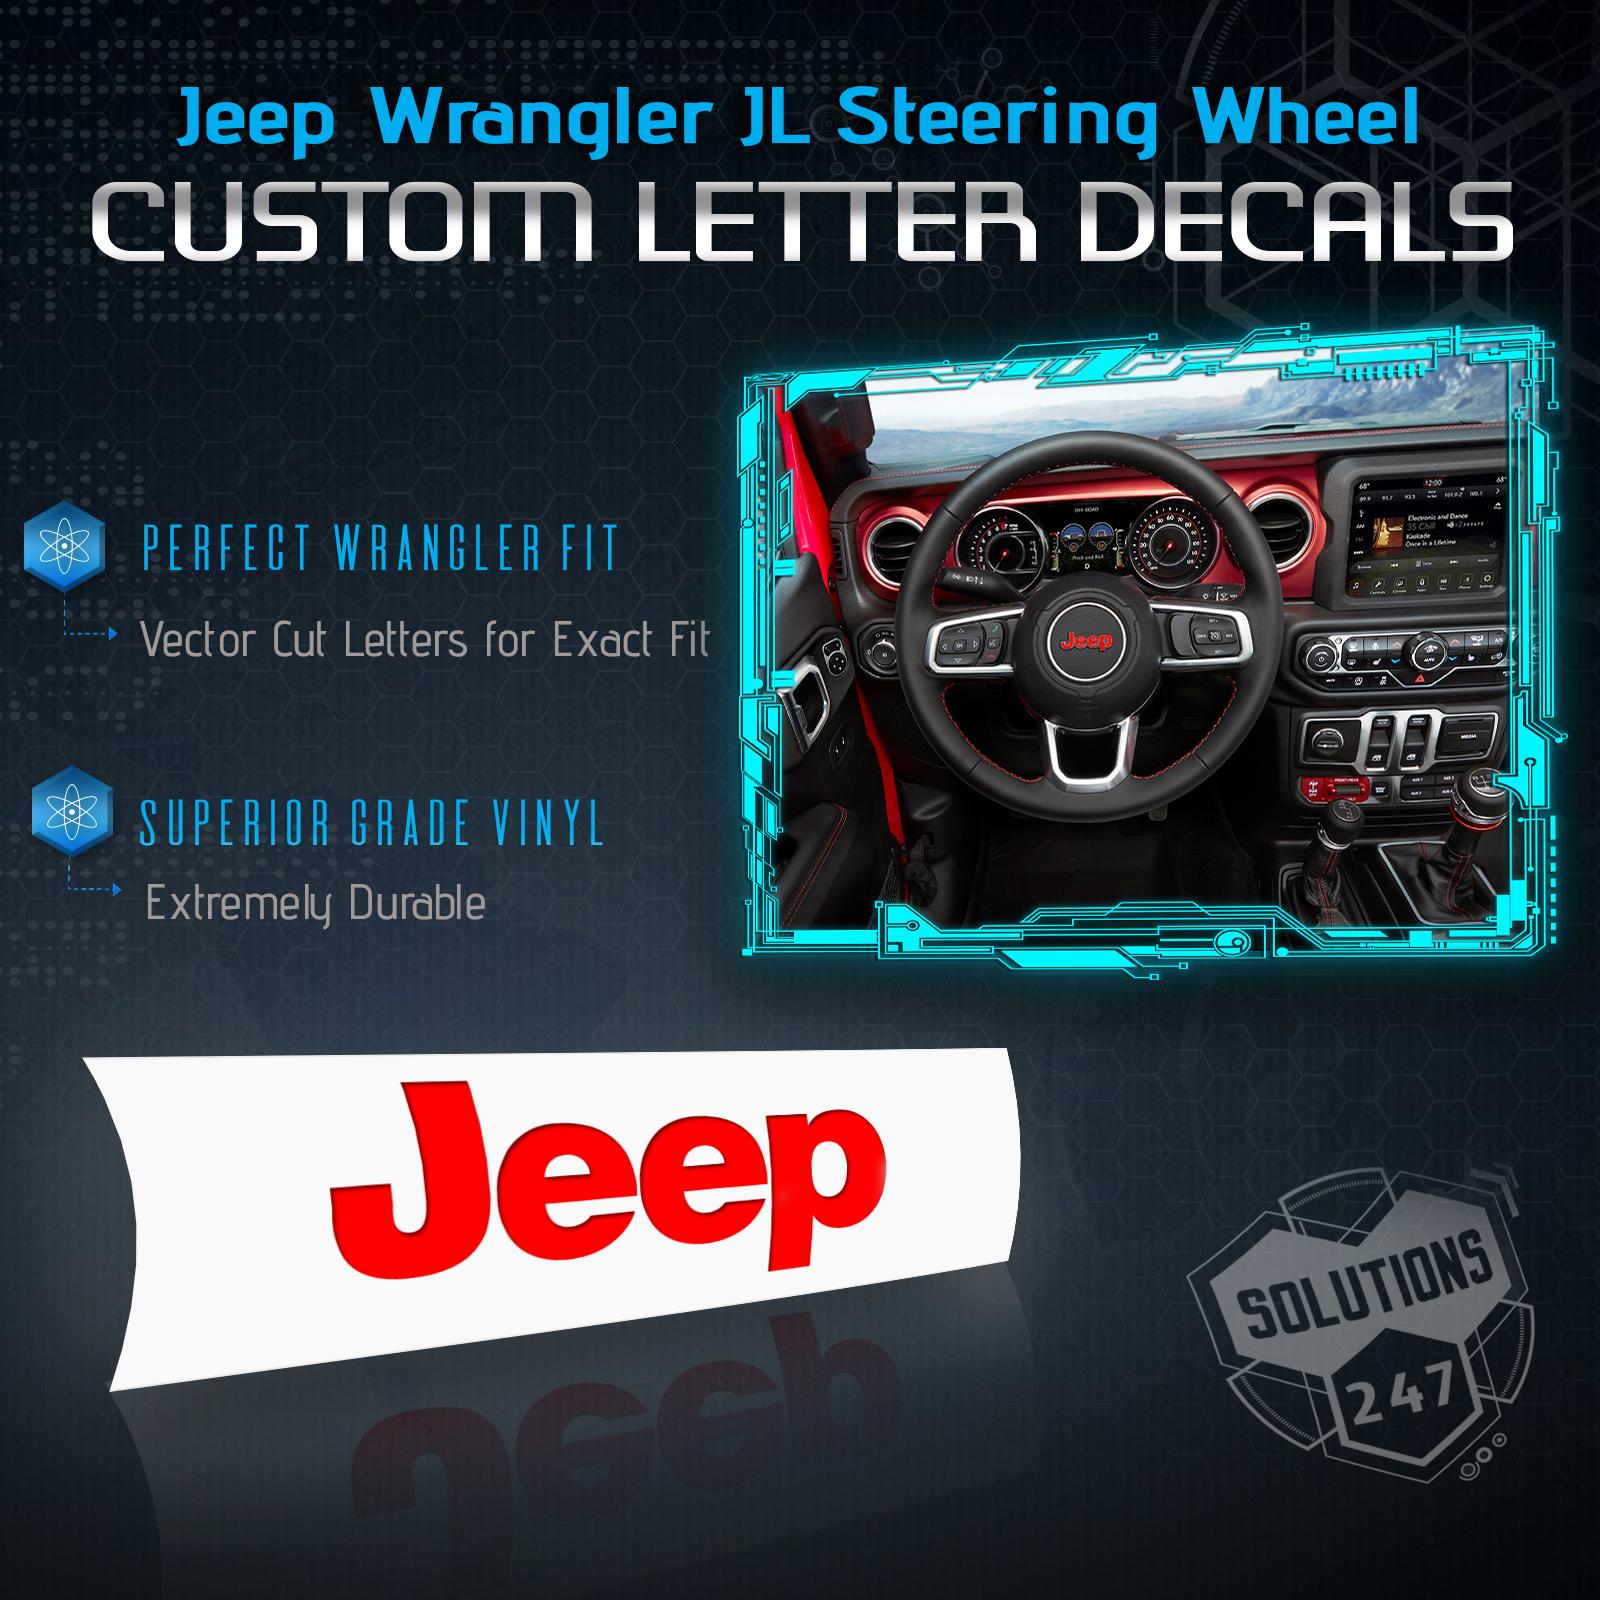 Jeep Wrangler JL New Gloss Black JEEP Steering Wheel Logo Vinyl Decal For 2018